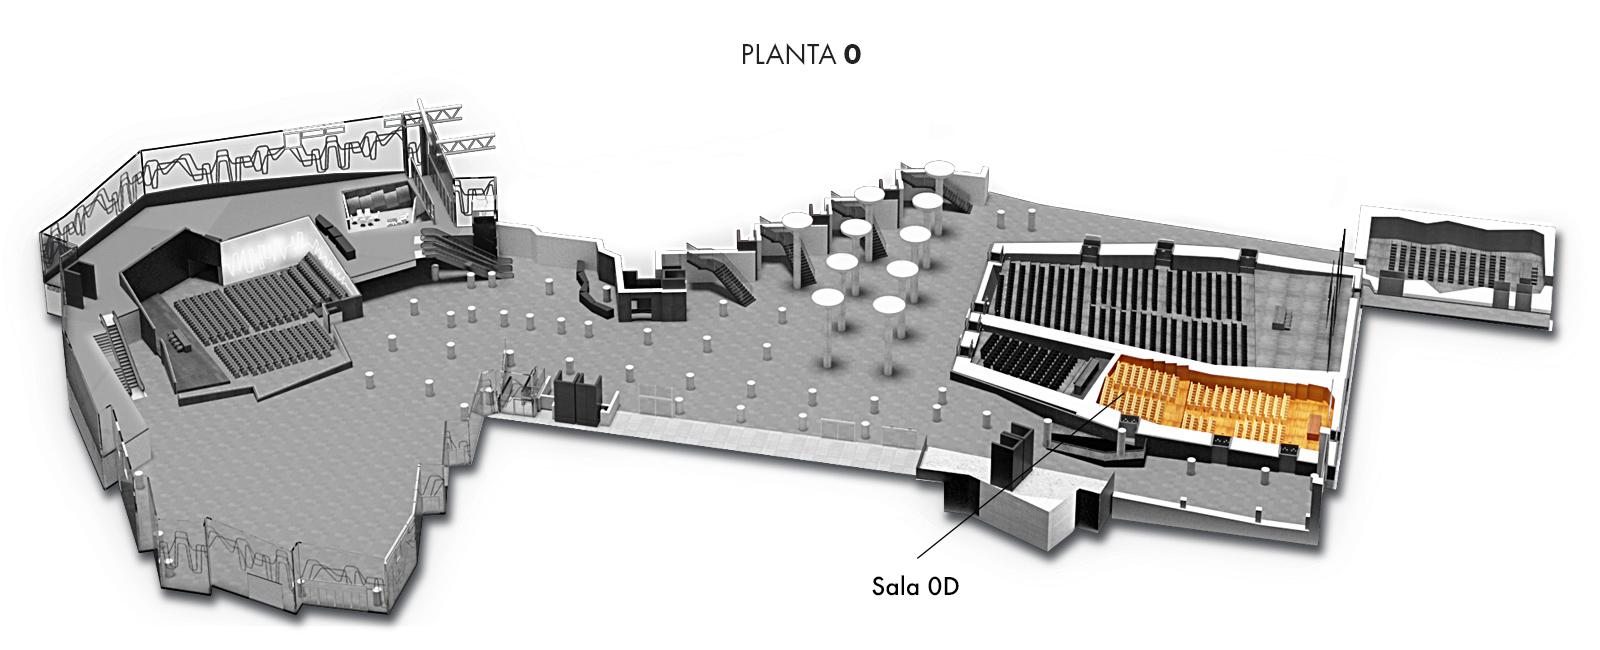 Sala 0D, Planta 0 | Palacio Euskalduna Jauregia